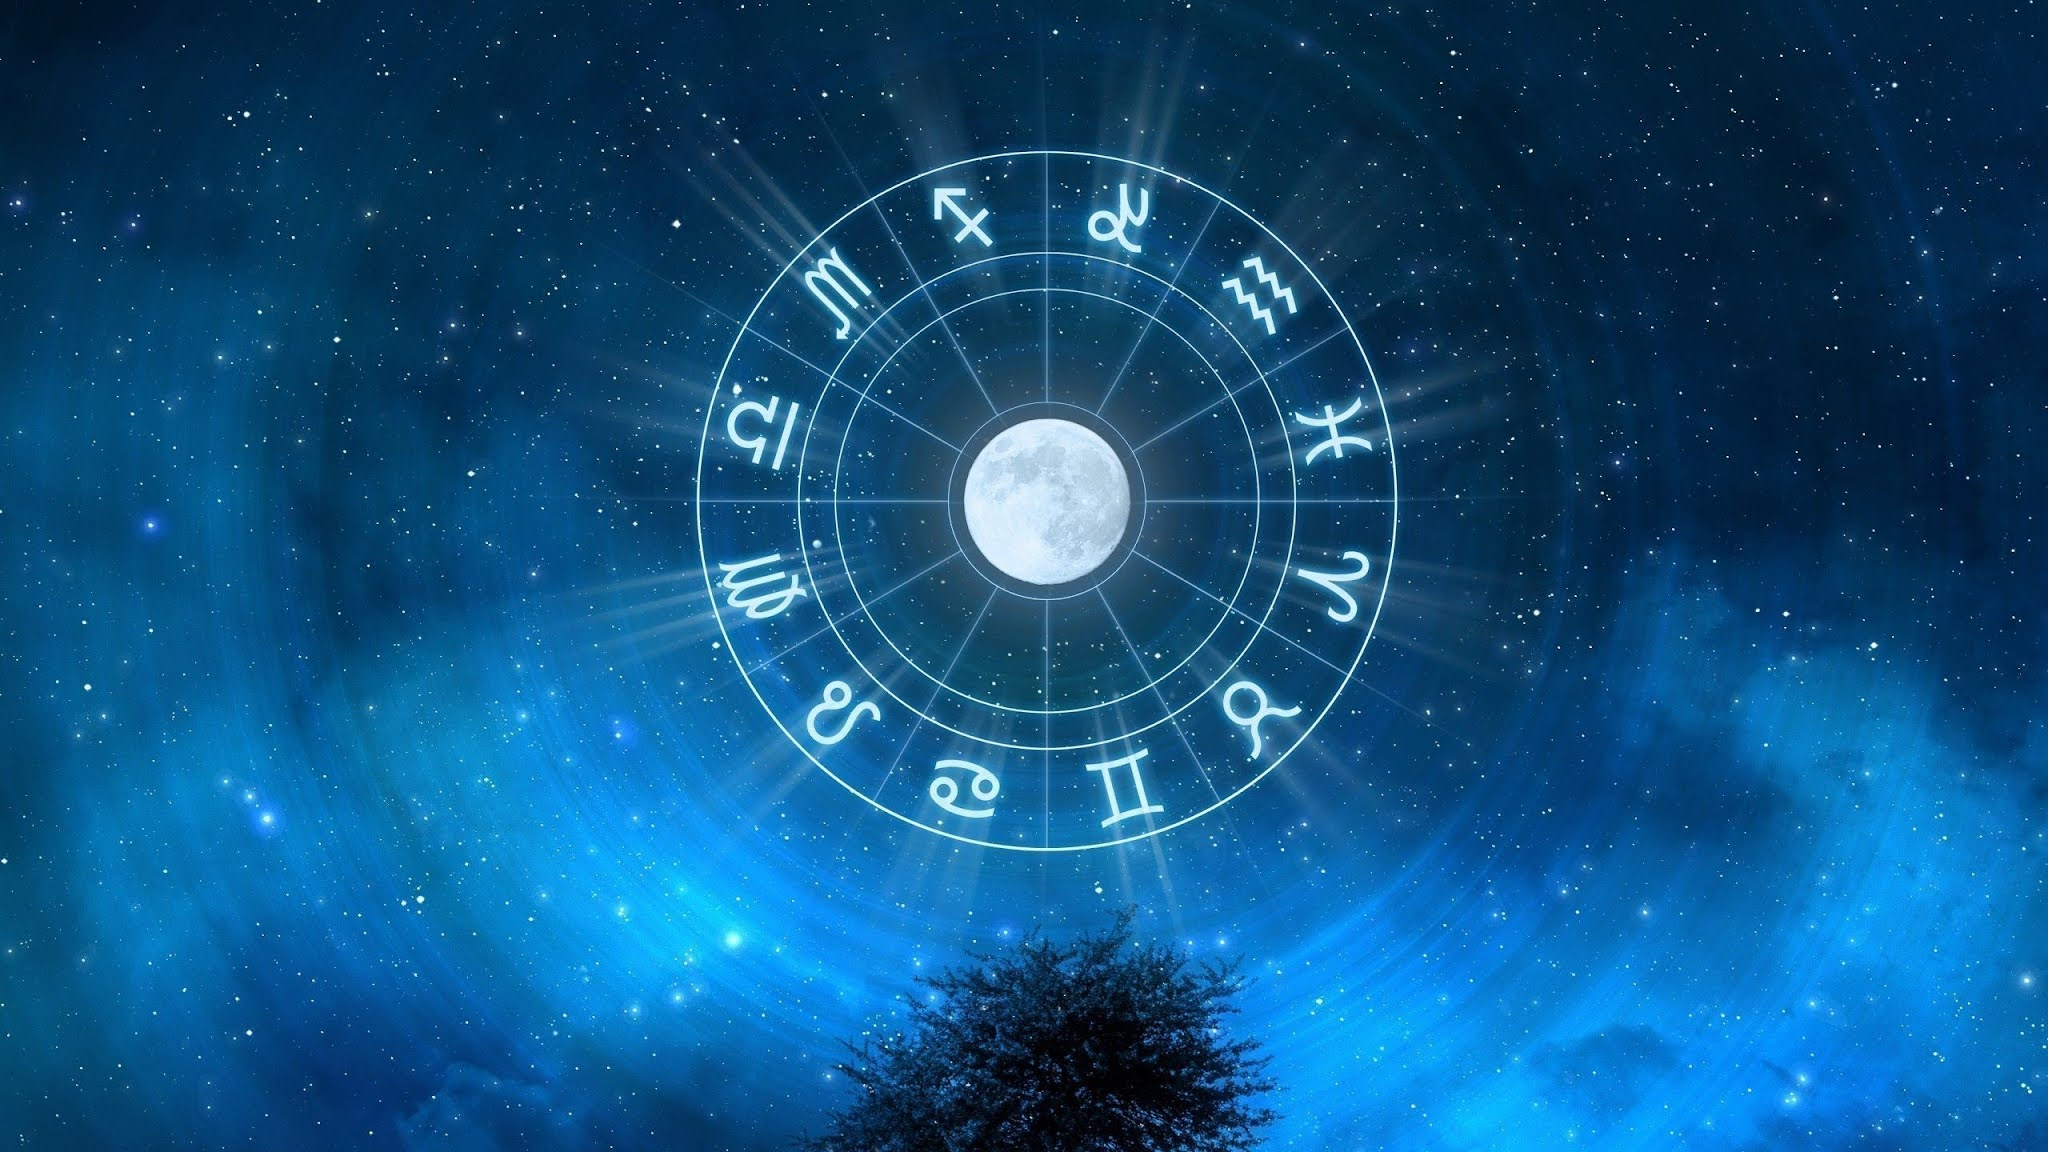 Astrologi! 3 Zodiak Berikut Dikenal Karena Kerendahan Hatinya